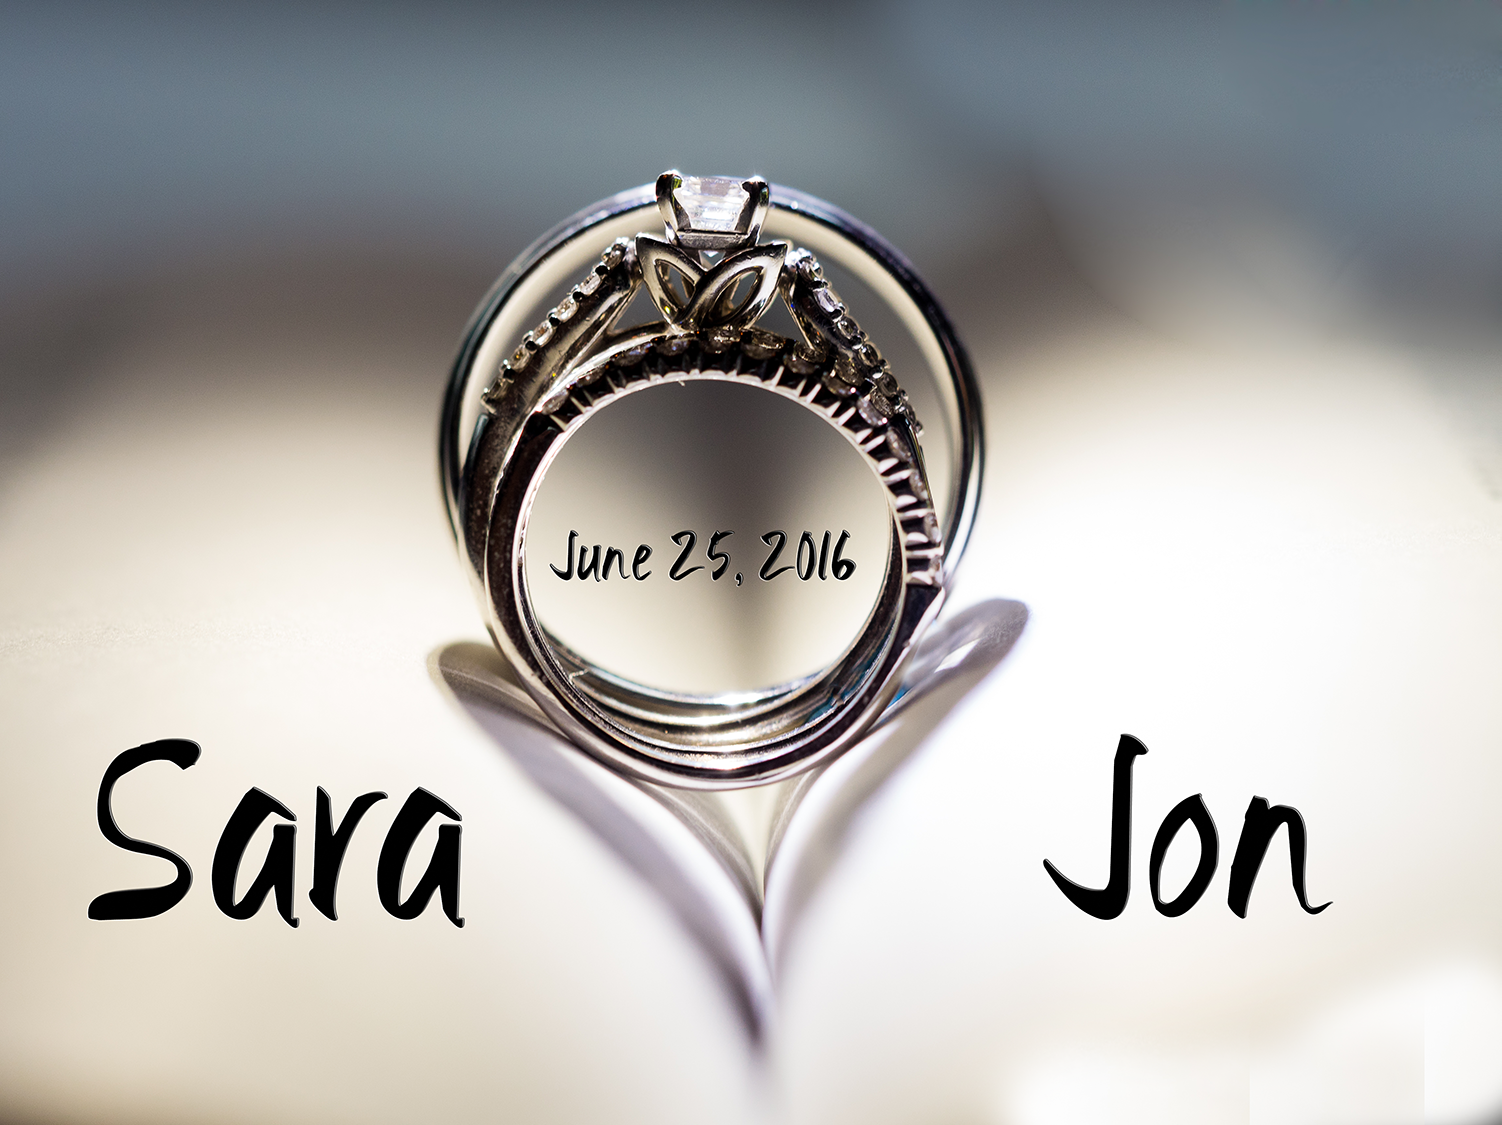 creative-wedding-ring-image.png